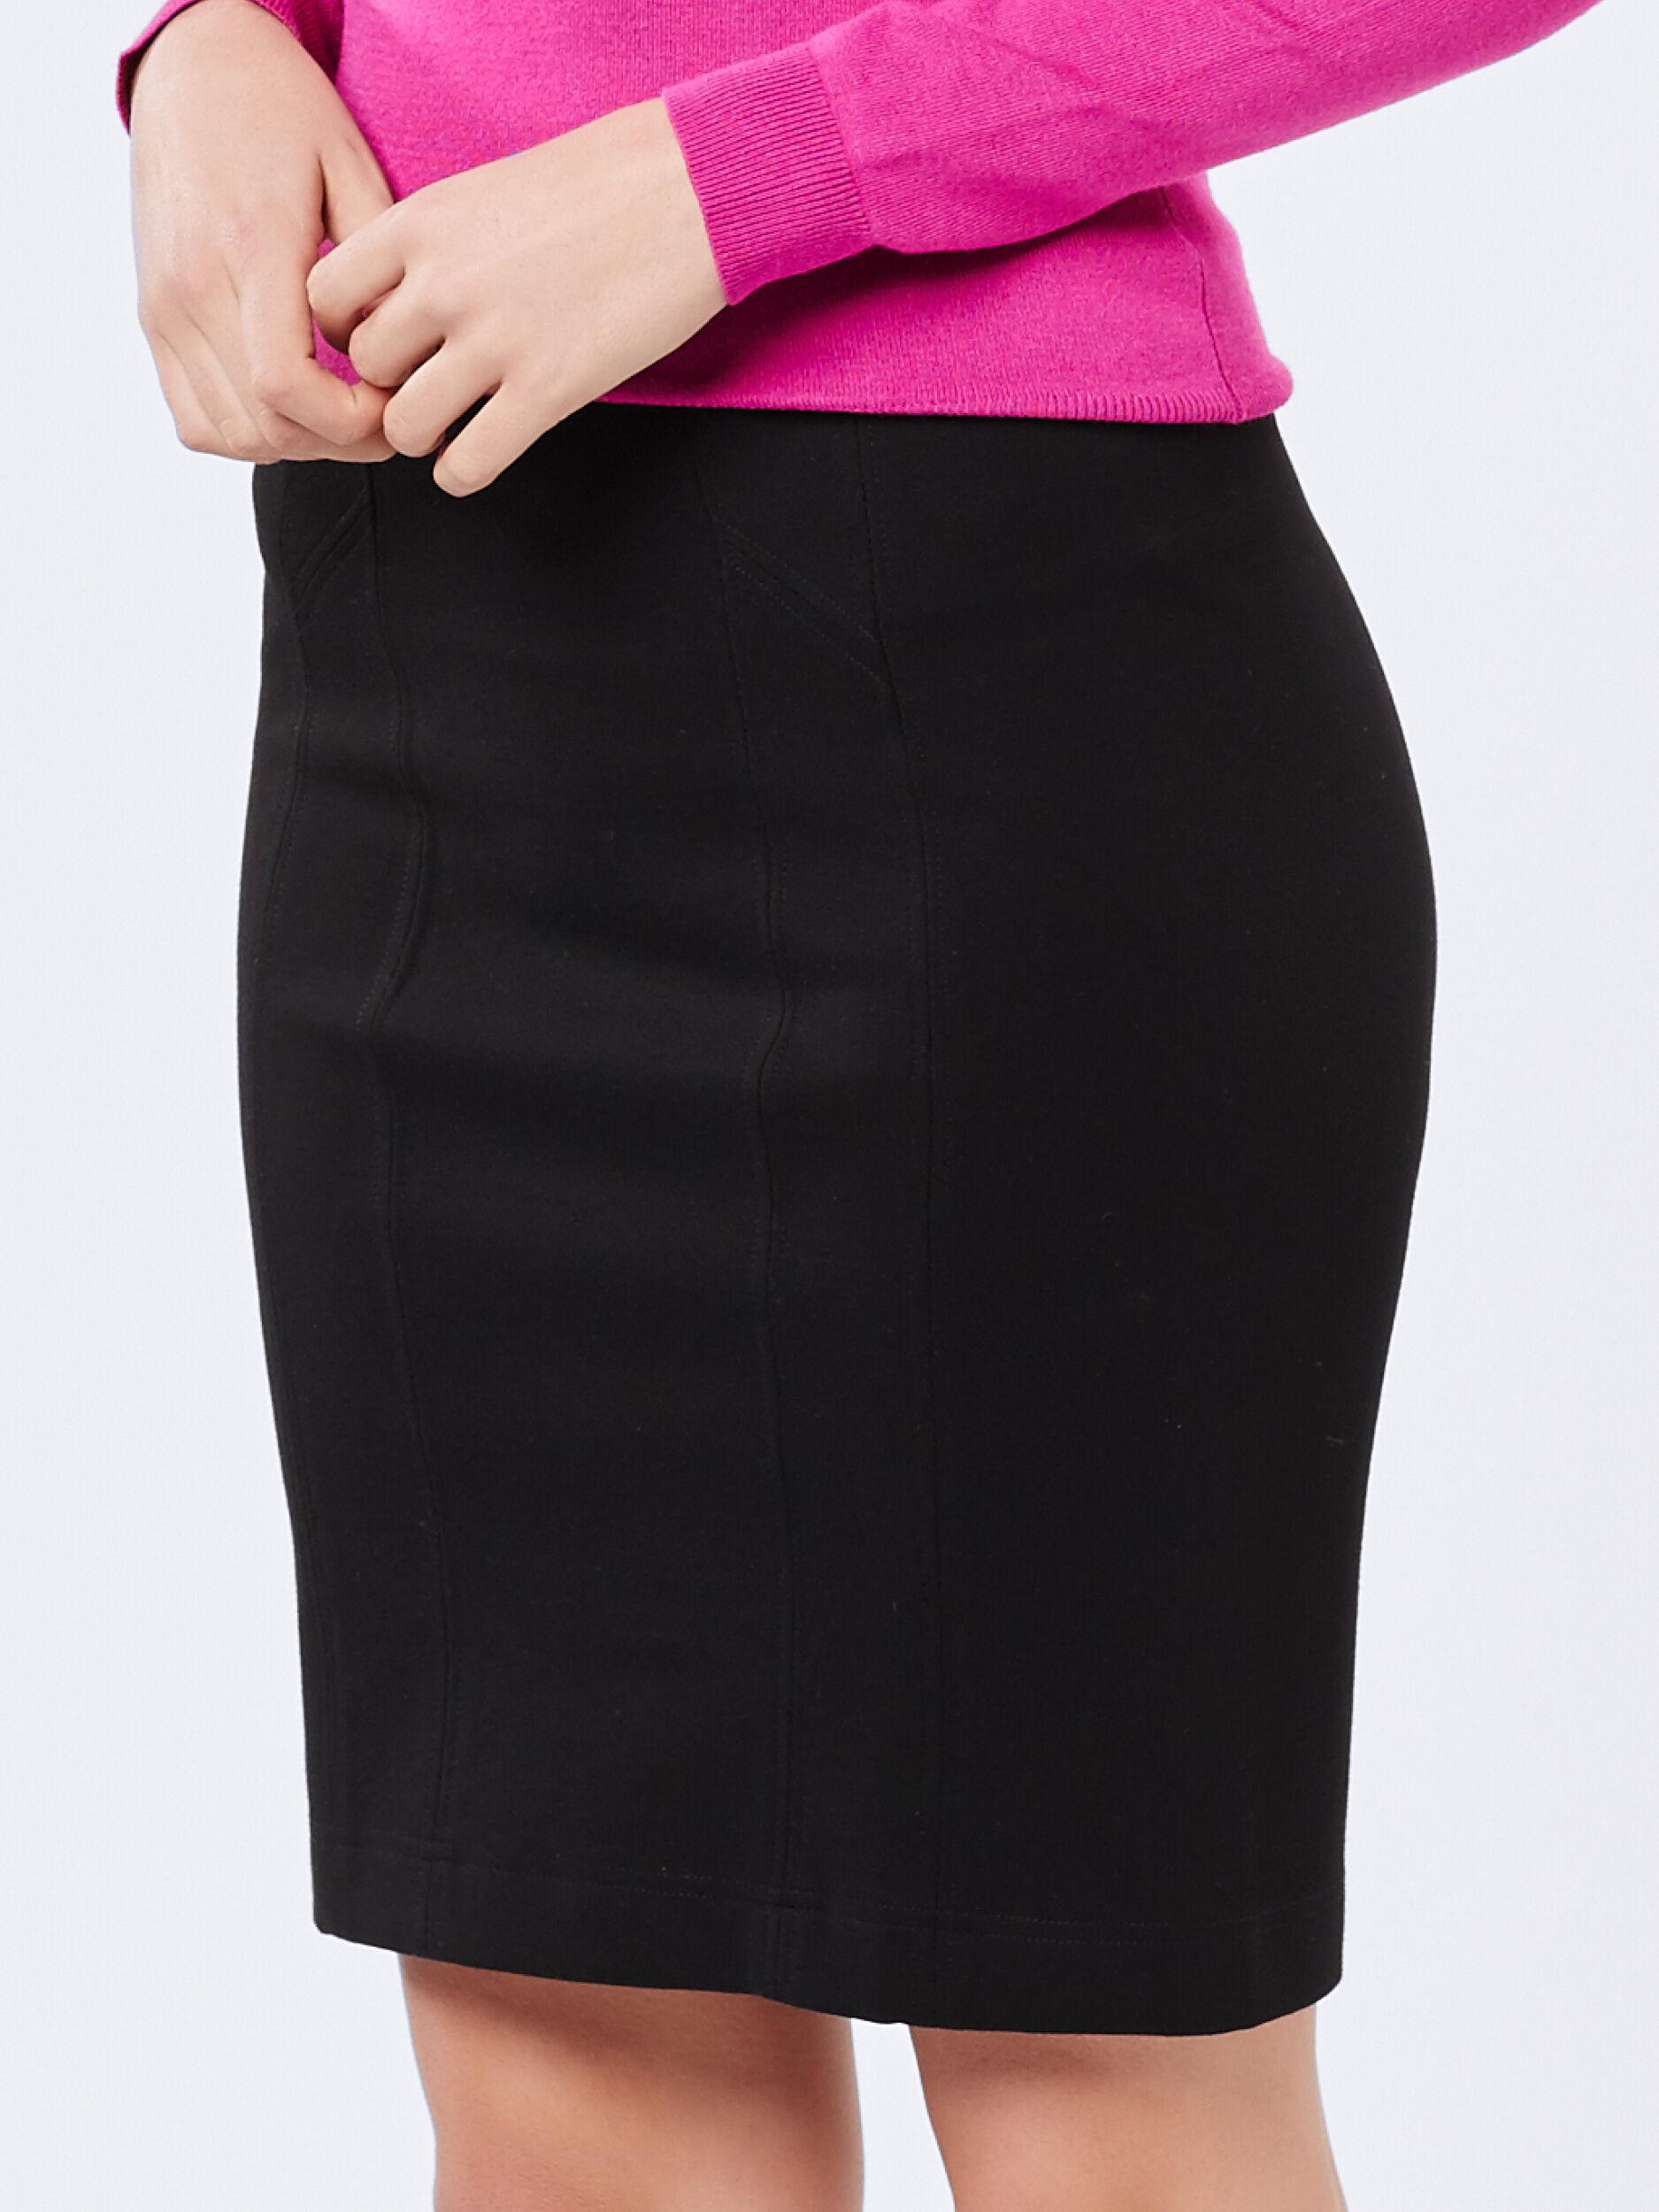 Freya Skirt